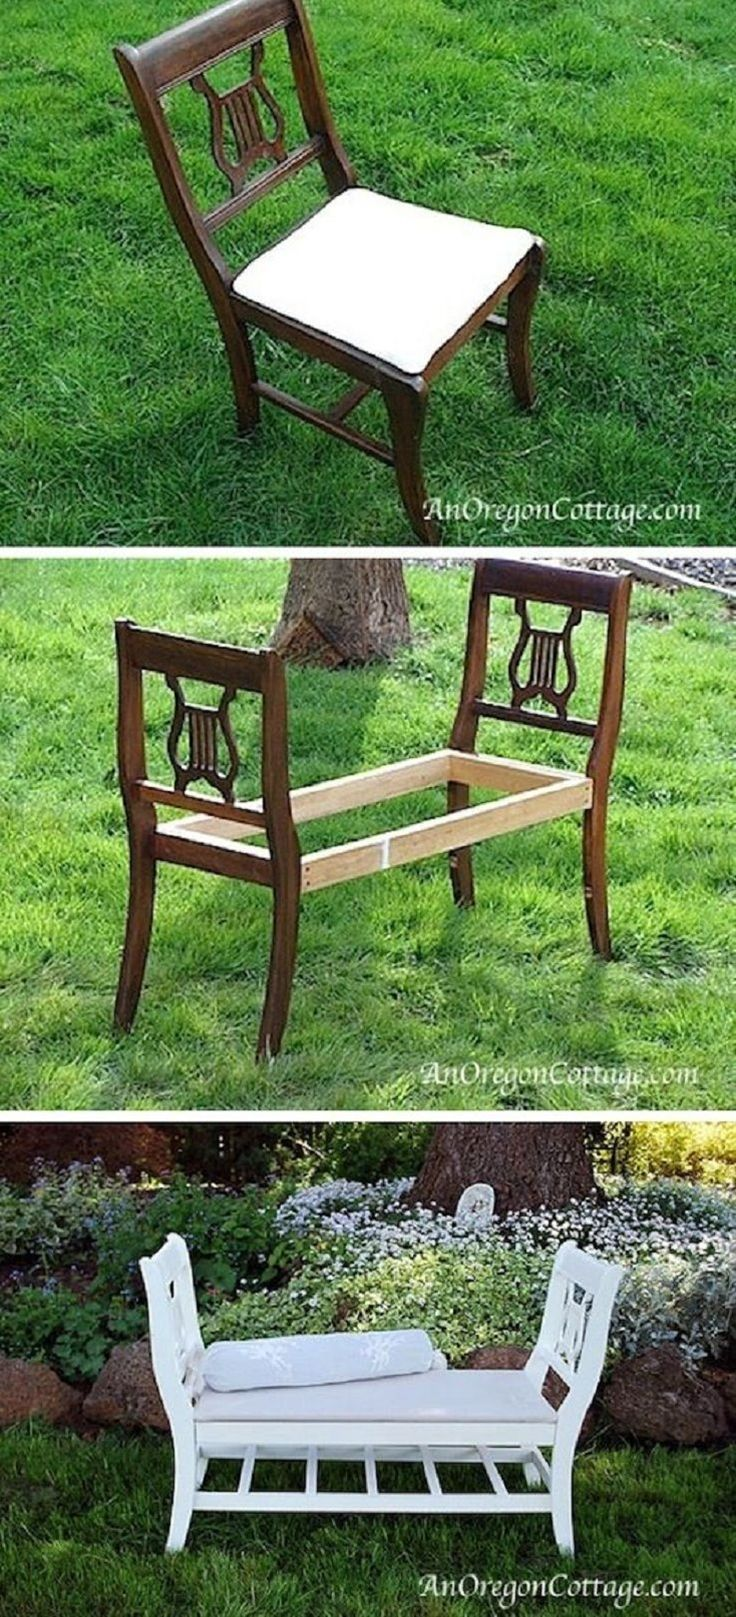 best Vermaak images on Pinterest Salvaged furniture Ornaments